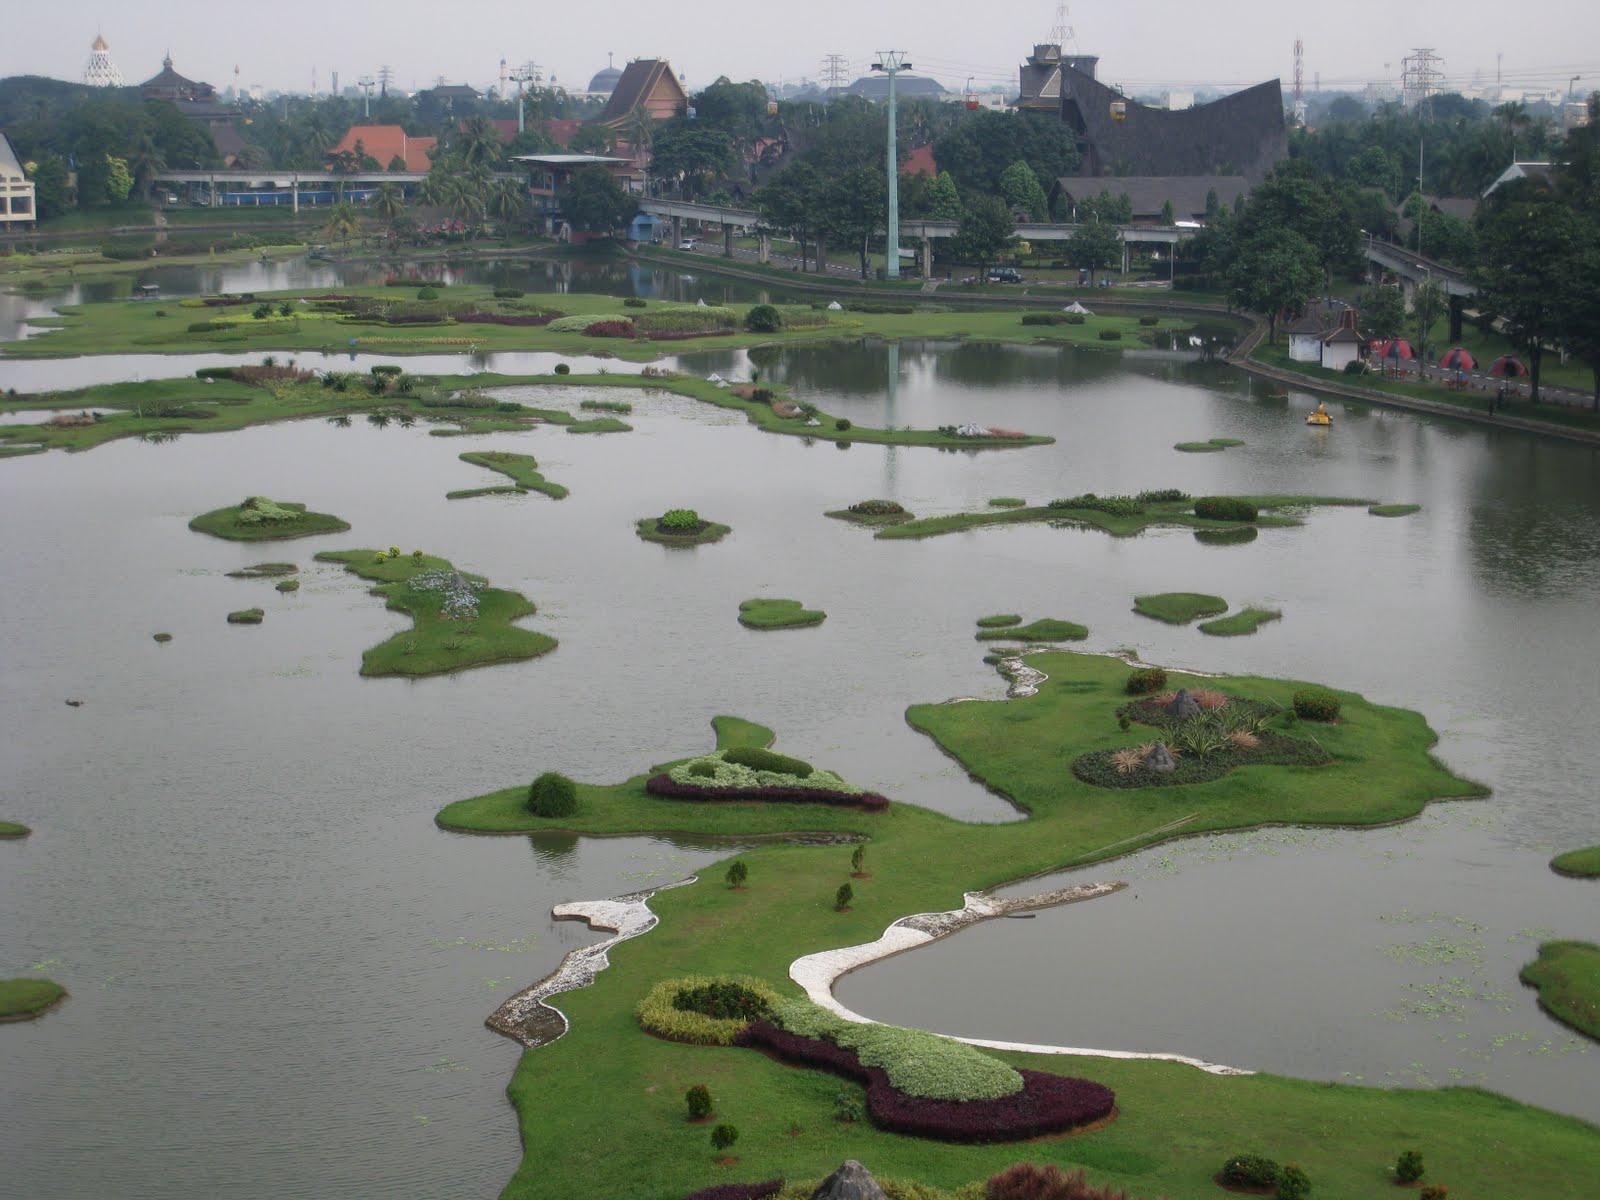 Indonesia_in_miniature%2C_Taman_Mini_Indonesia_Indah.jpg